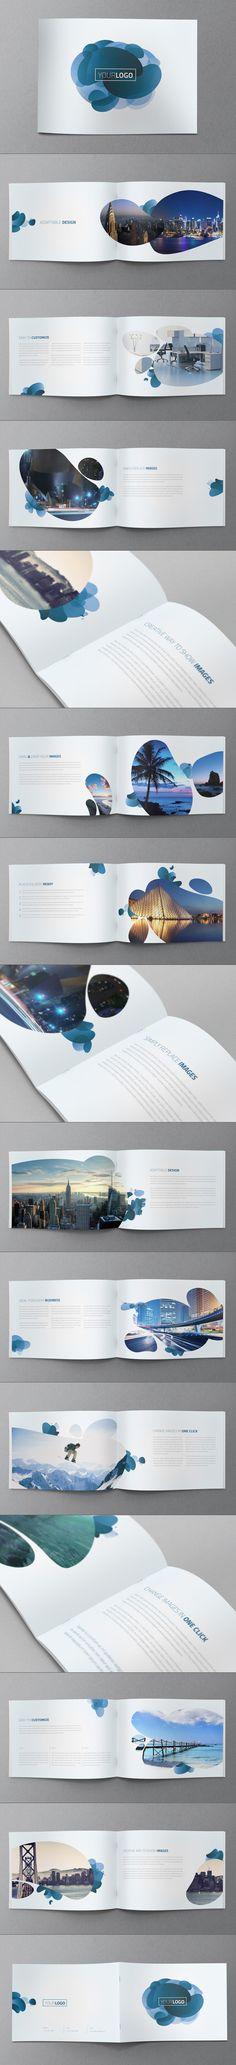 Abstract Brochure Design | Designer: Abra Design